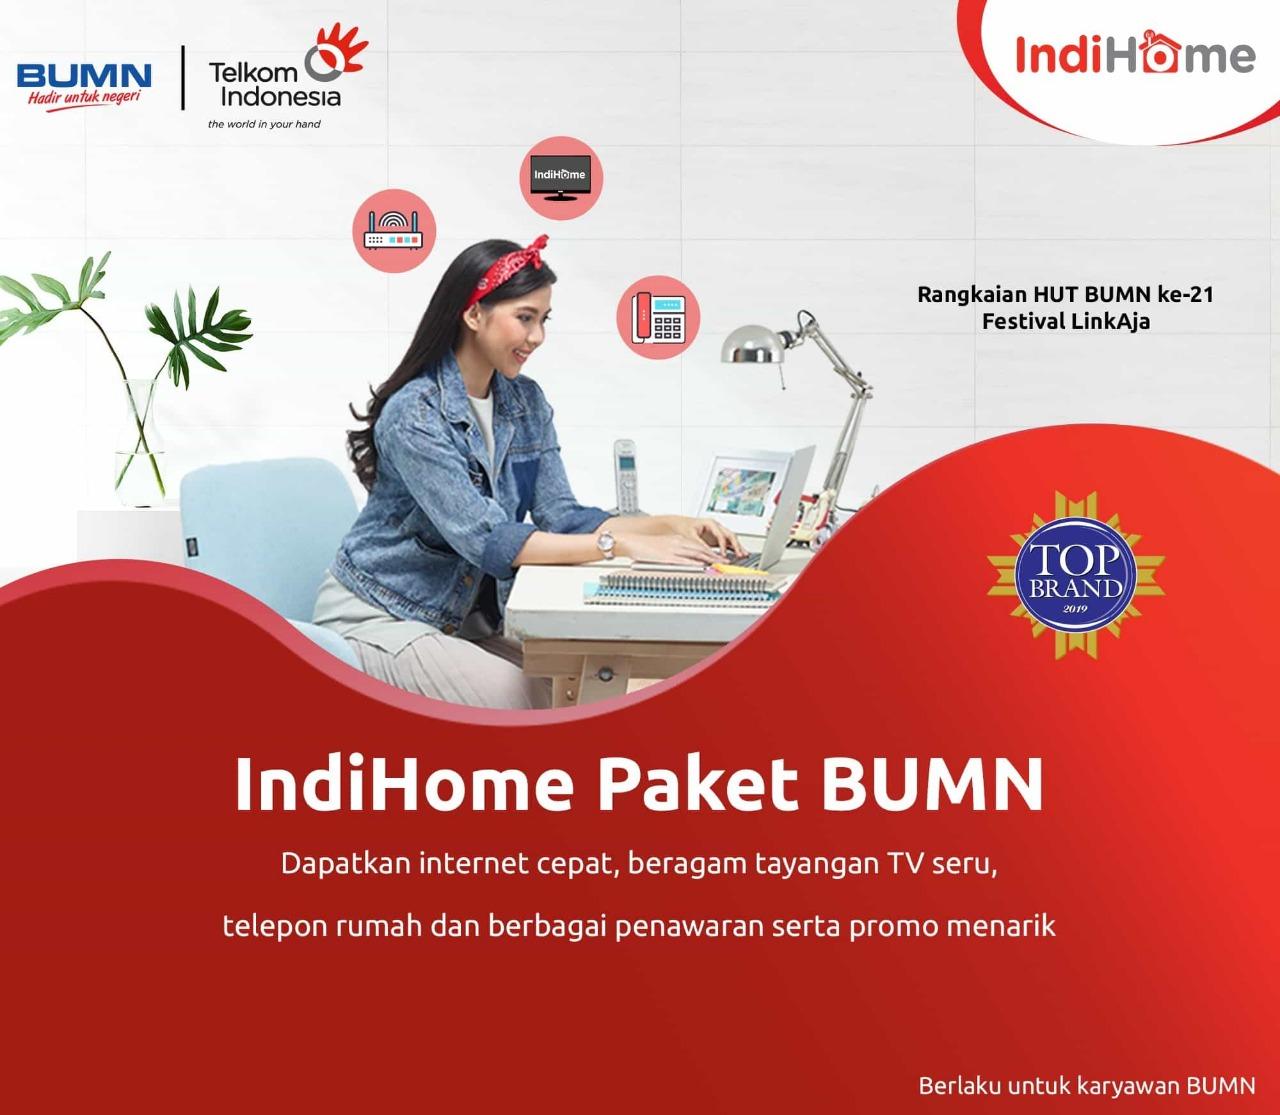 IndiHome-Paket-BUMN_02028_M.jpeg